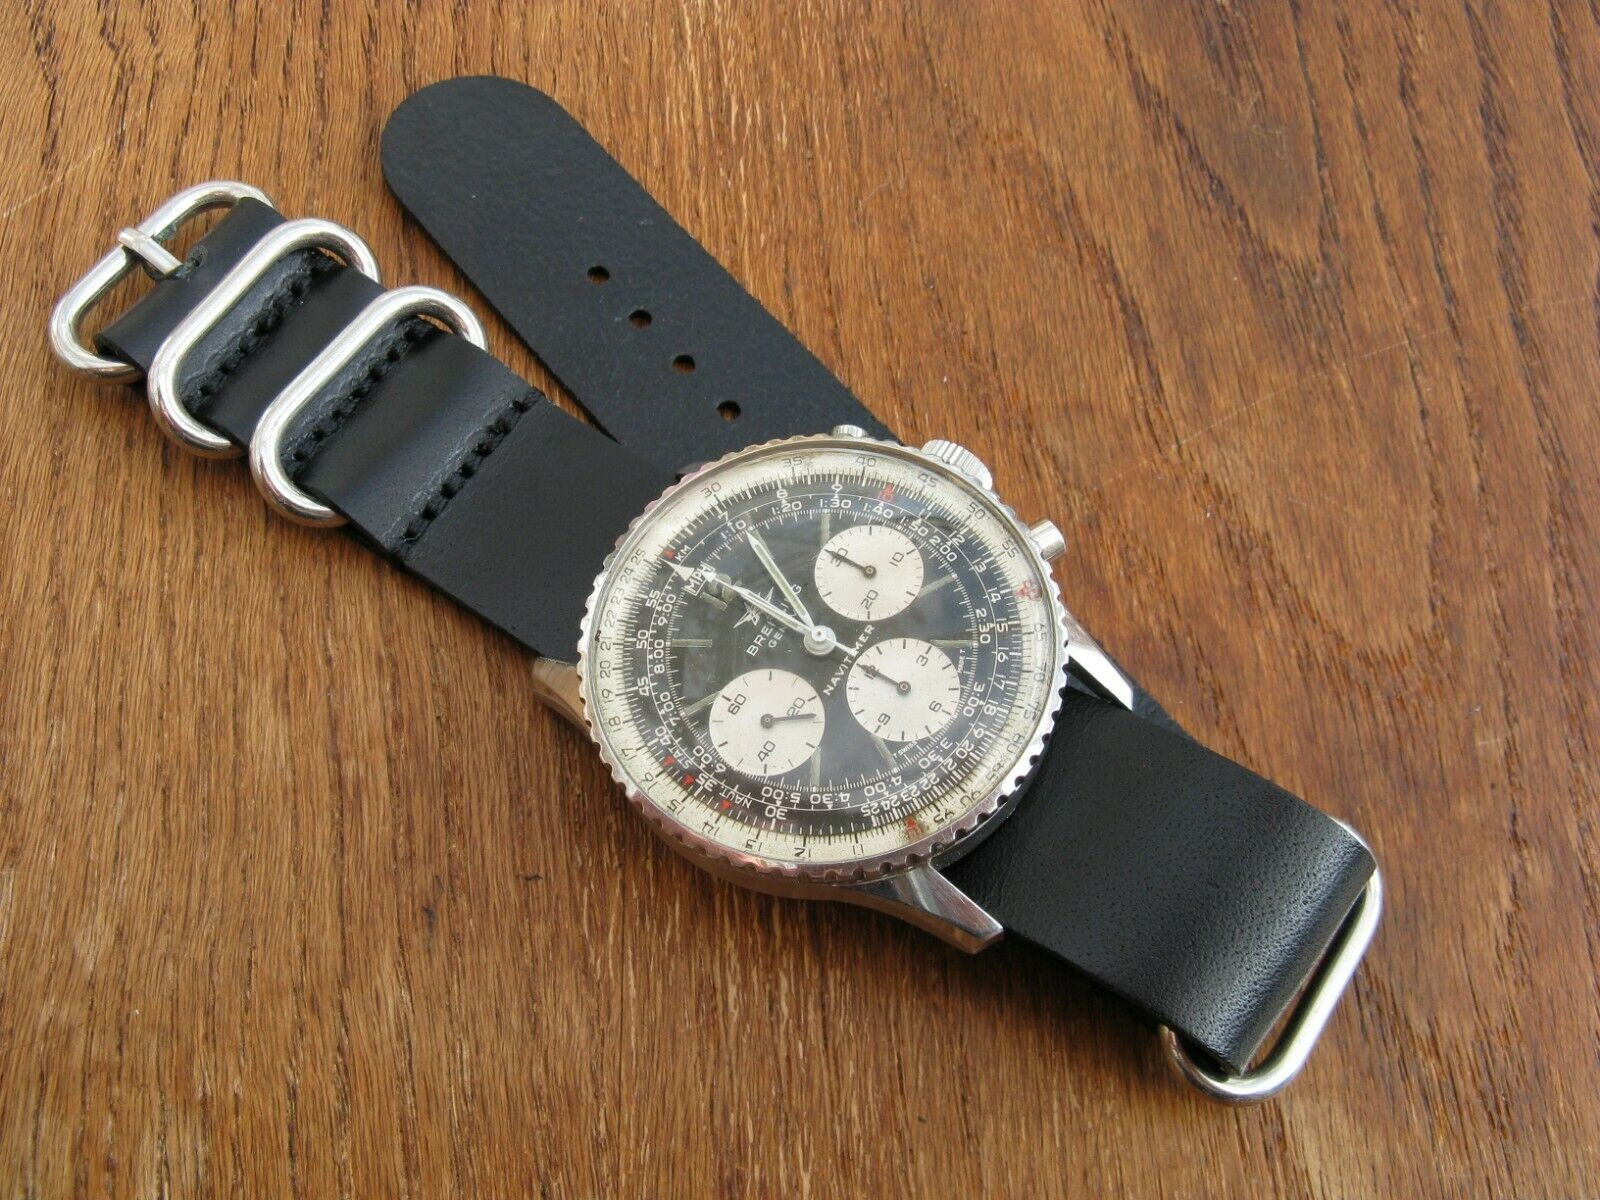 Black Leather 'Nato-Zulu'-Style Watch Strap Band 22mm